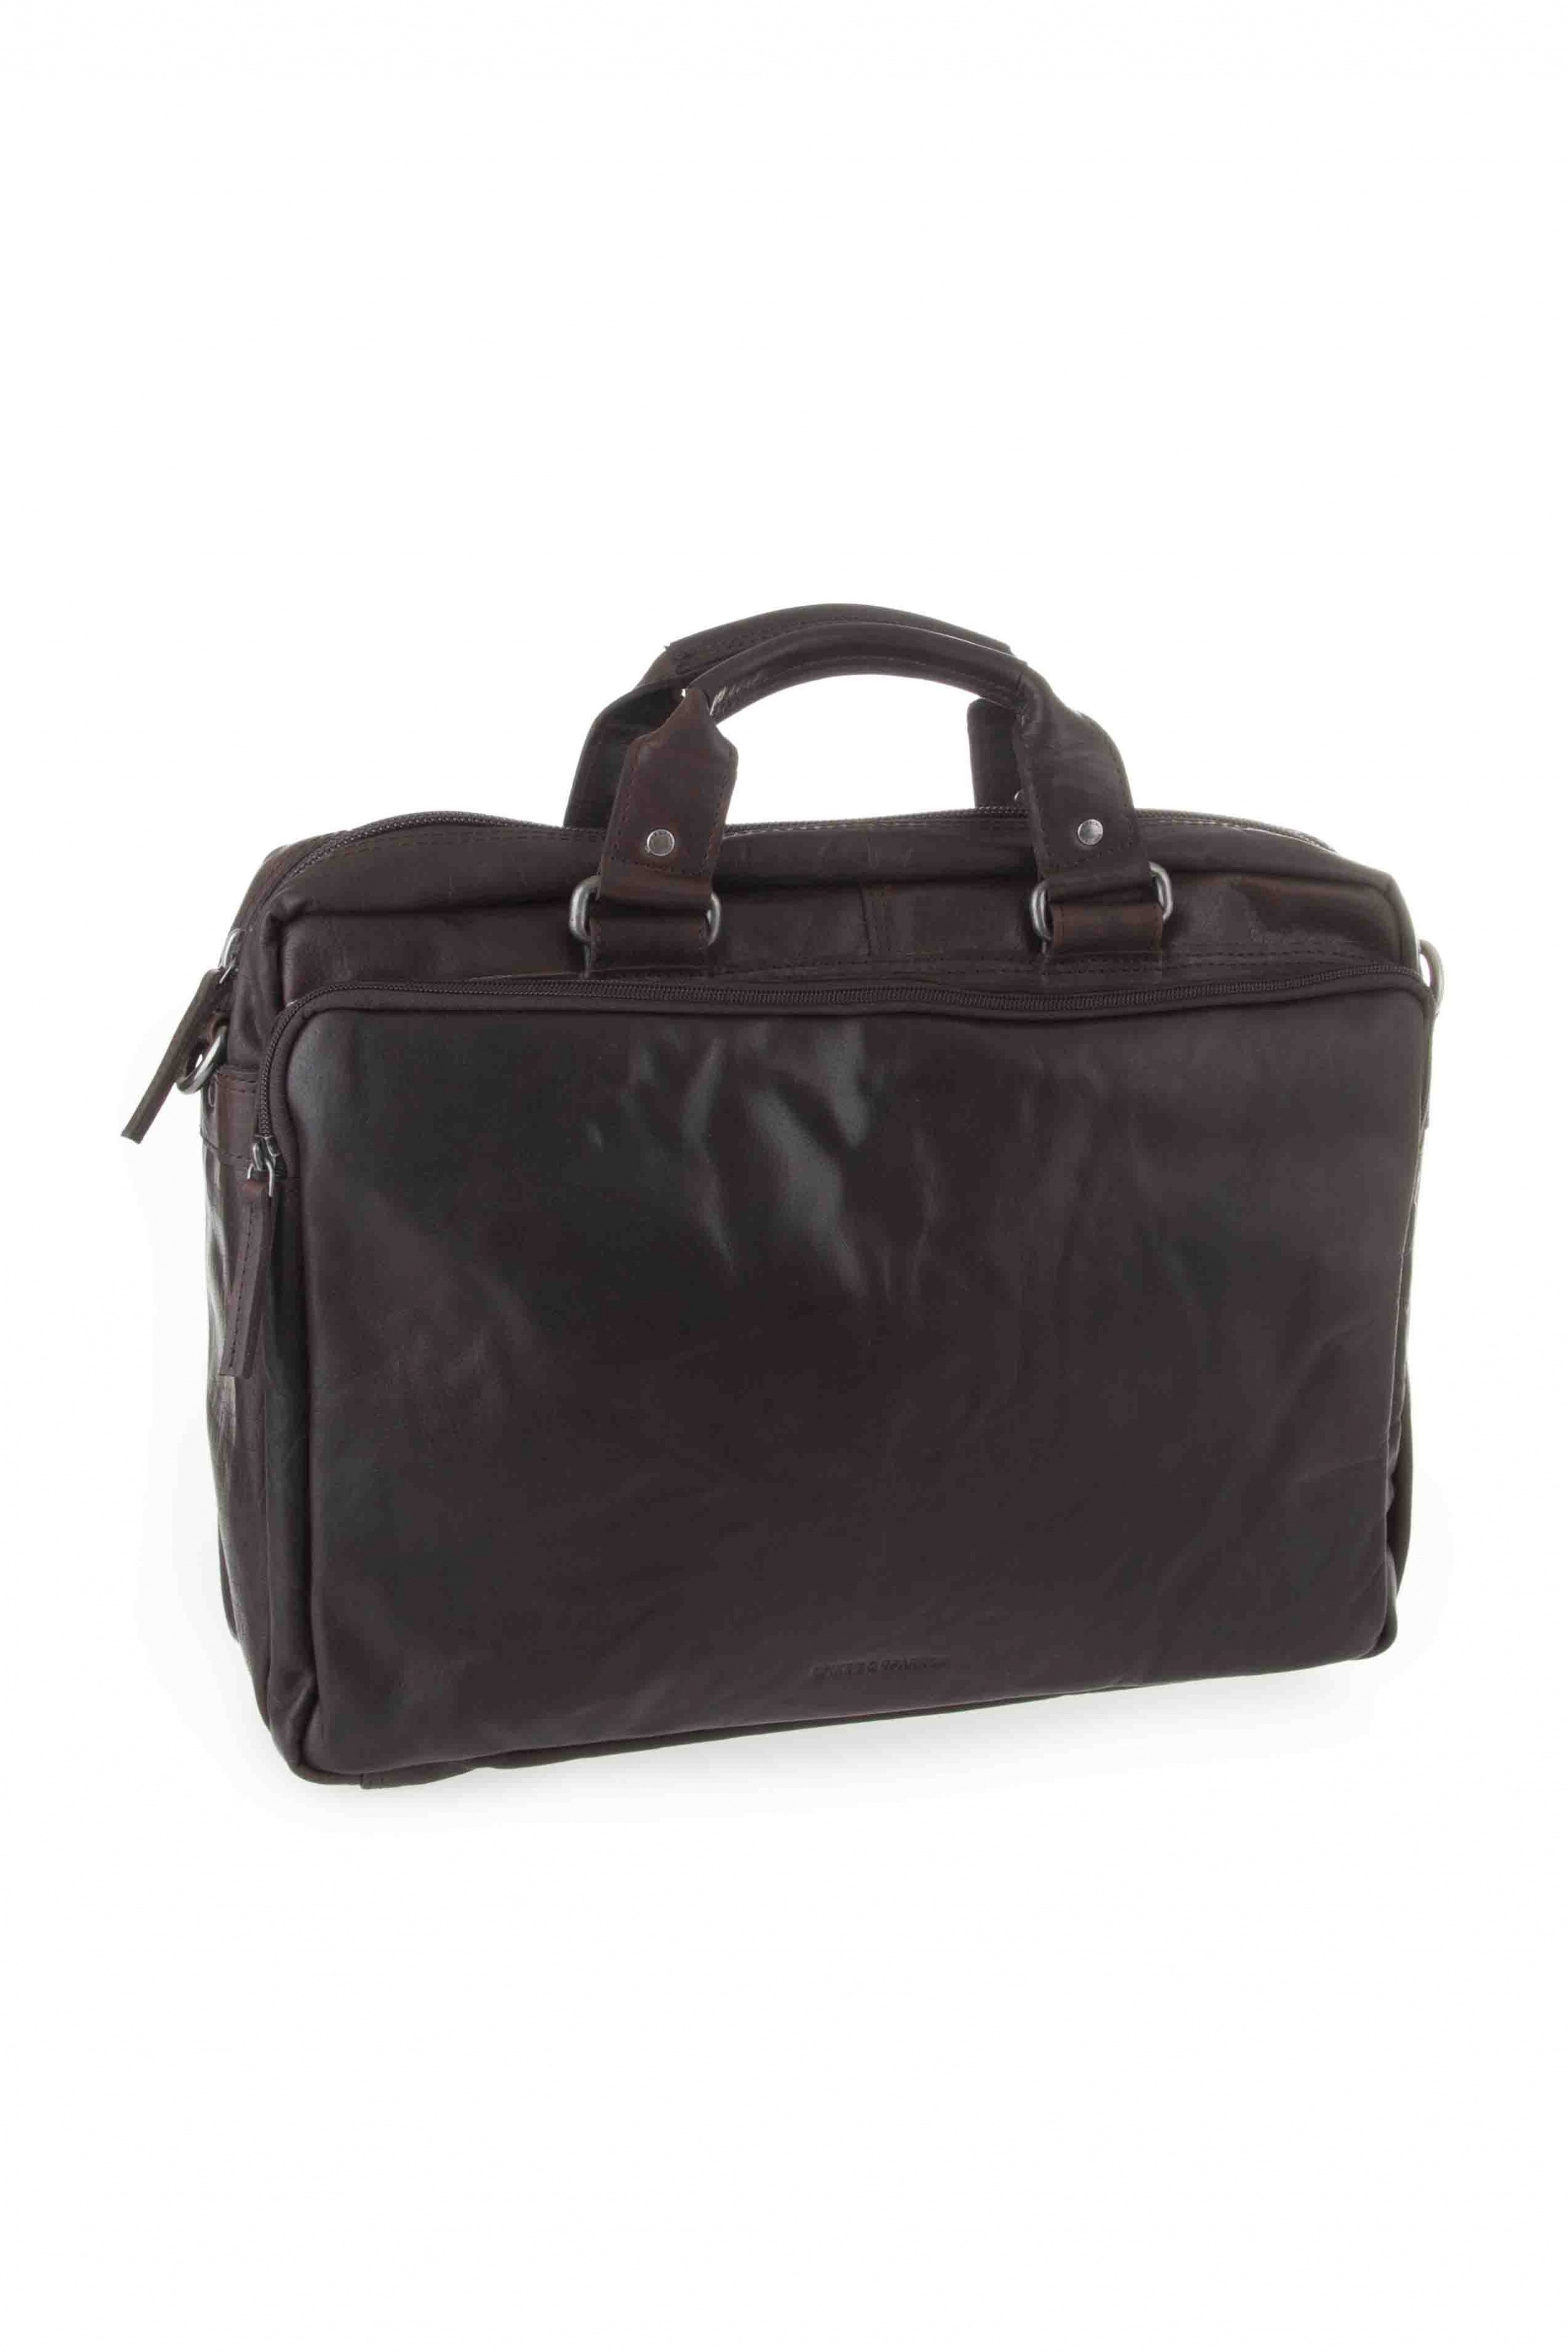 Spikes & Sparrow 3 zipper business bag 23824N Dark Brown